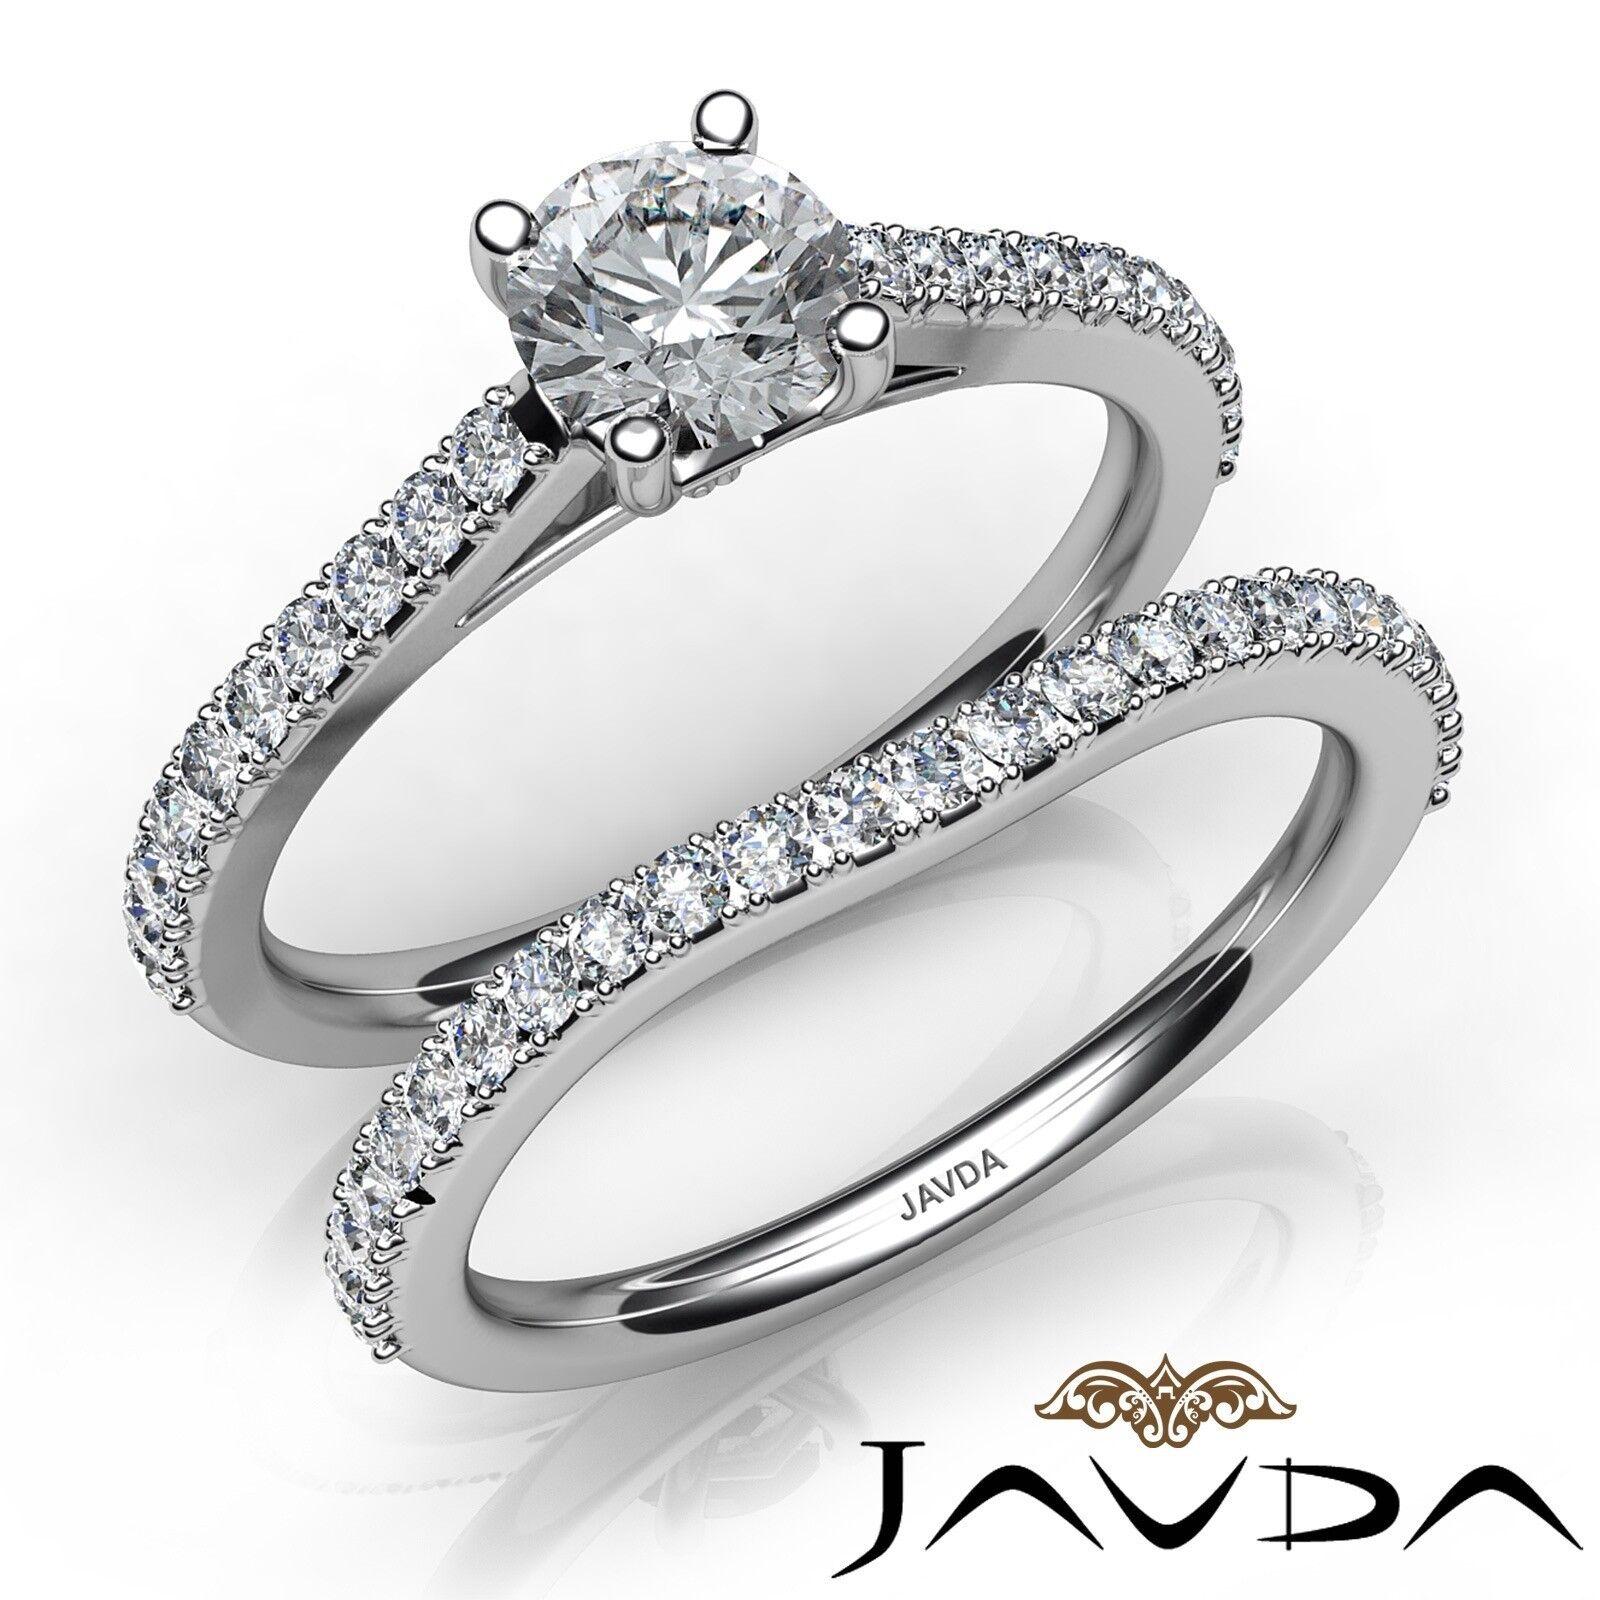 1.25ctw Prong Bridal Set Round Diamond Engagement Ring GIA F-VVS1 White Gold